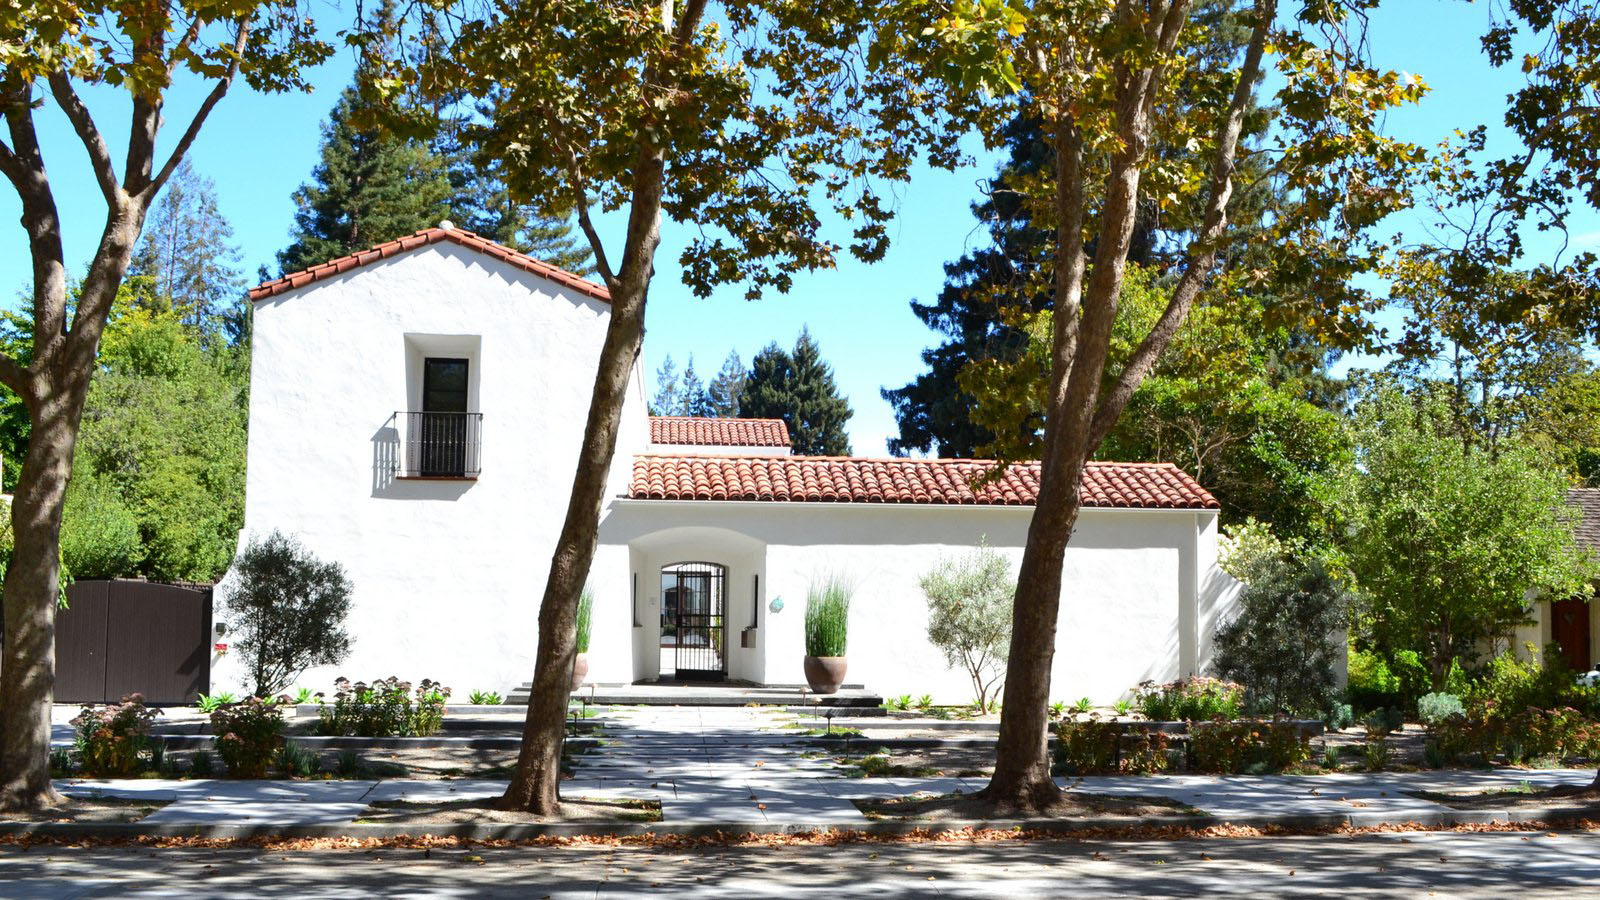 Project 2012-155 - Bernstein Residence